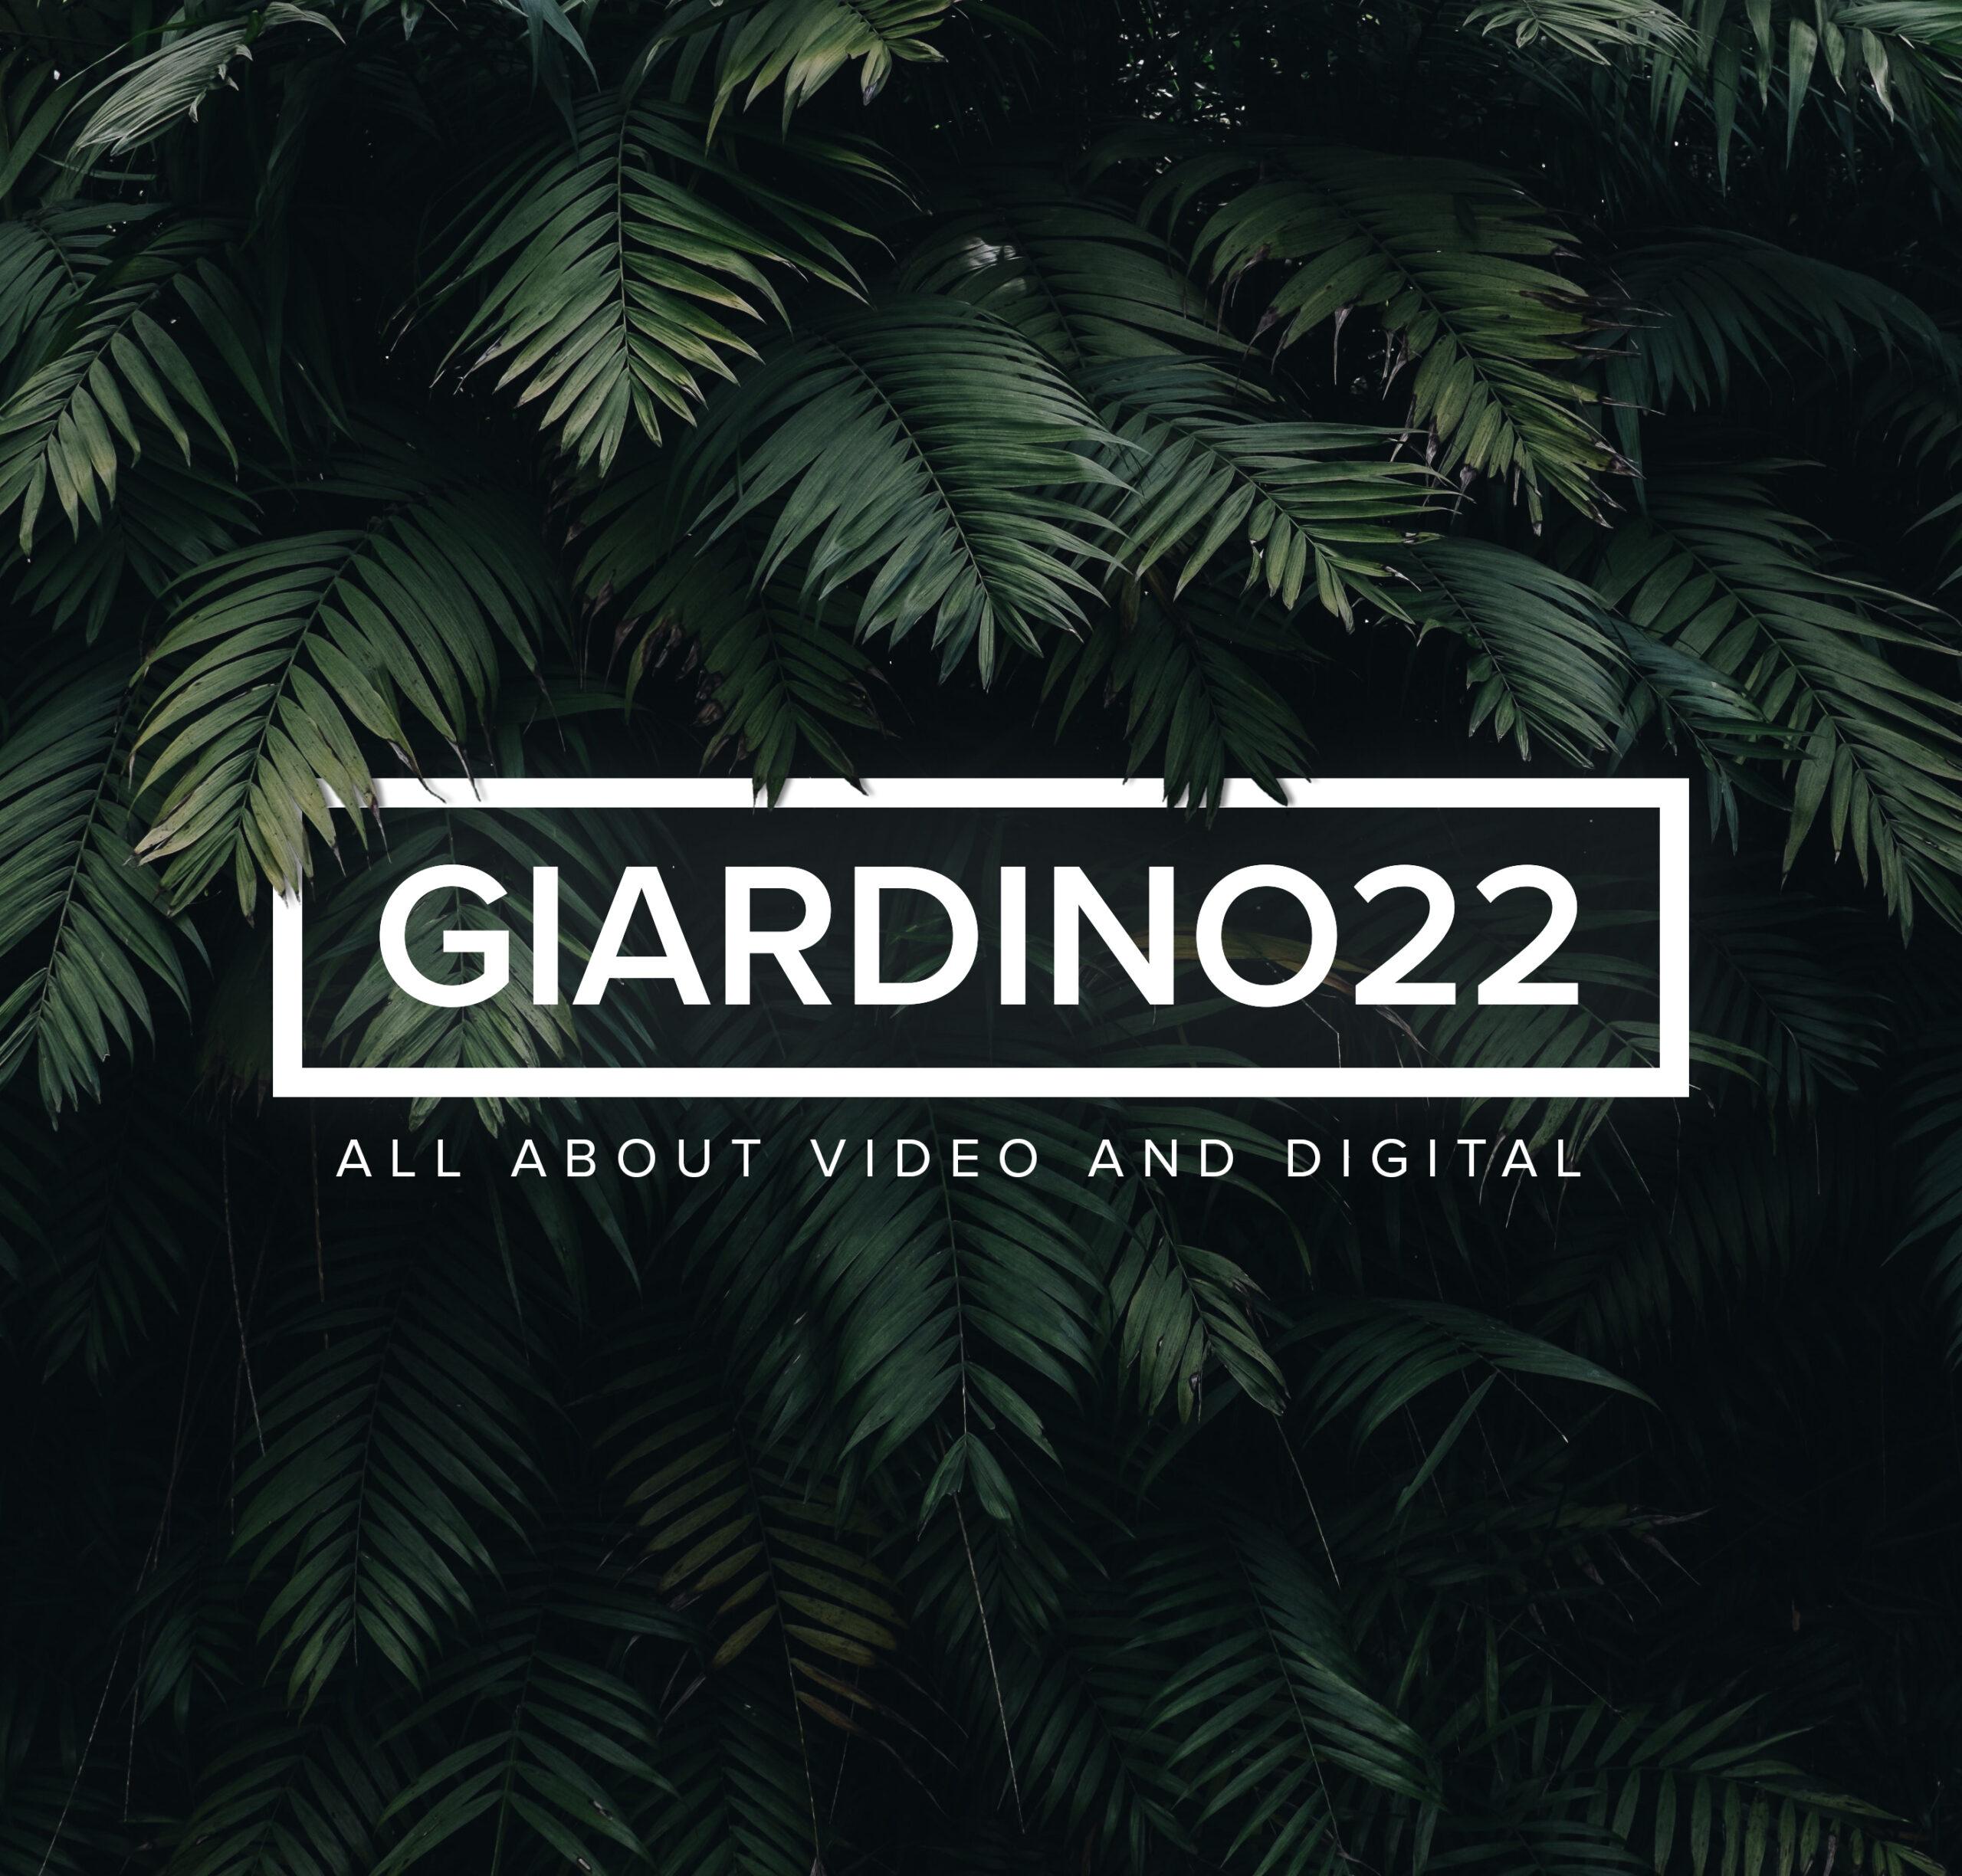 Giardino22.it